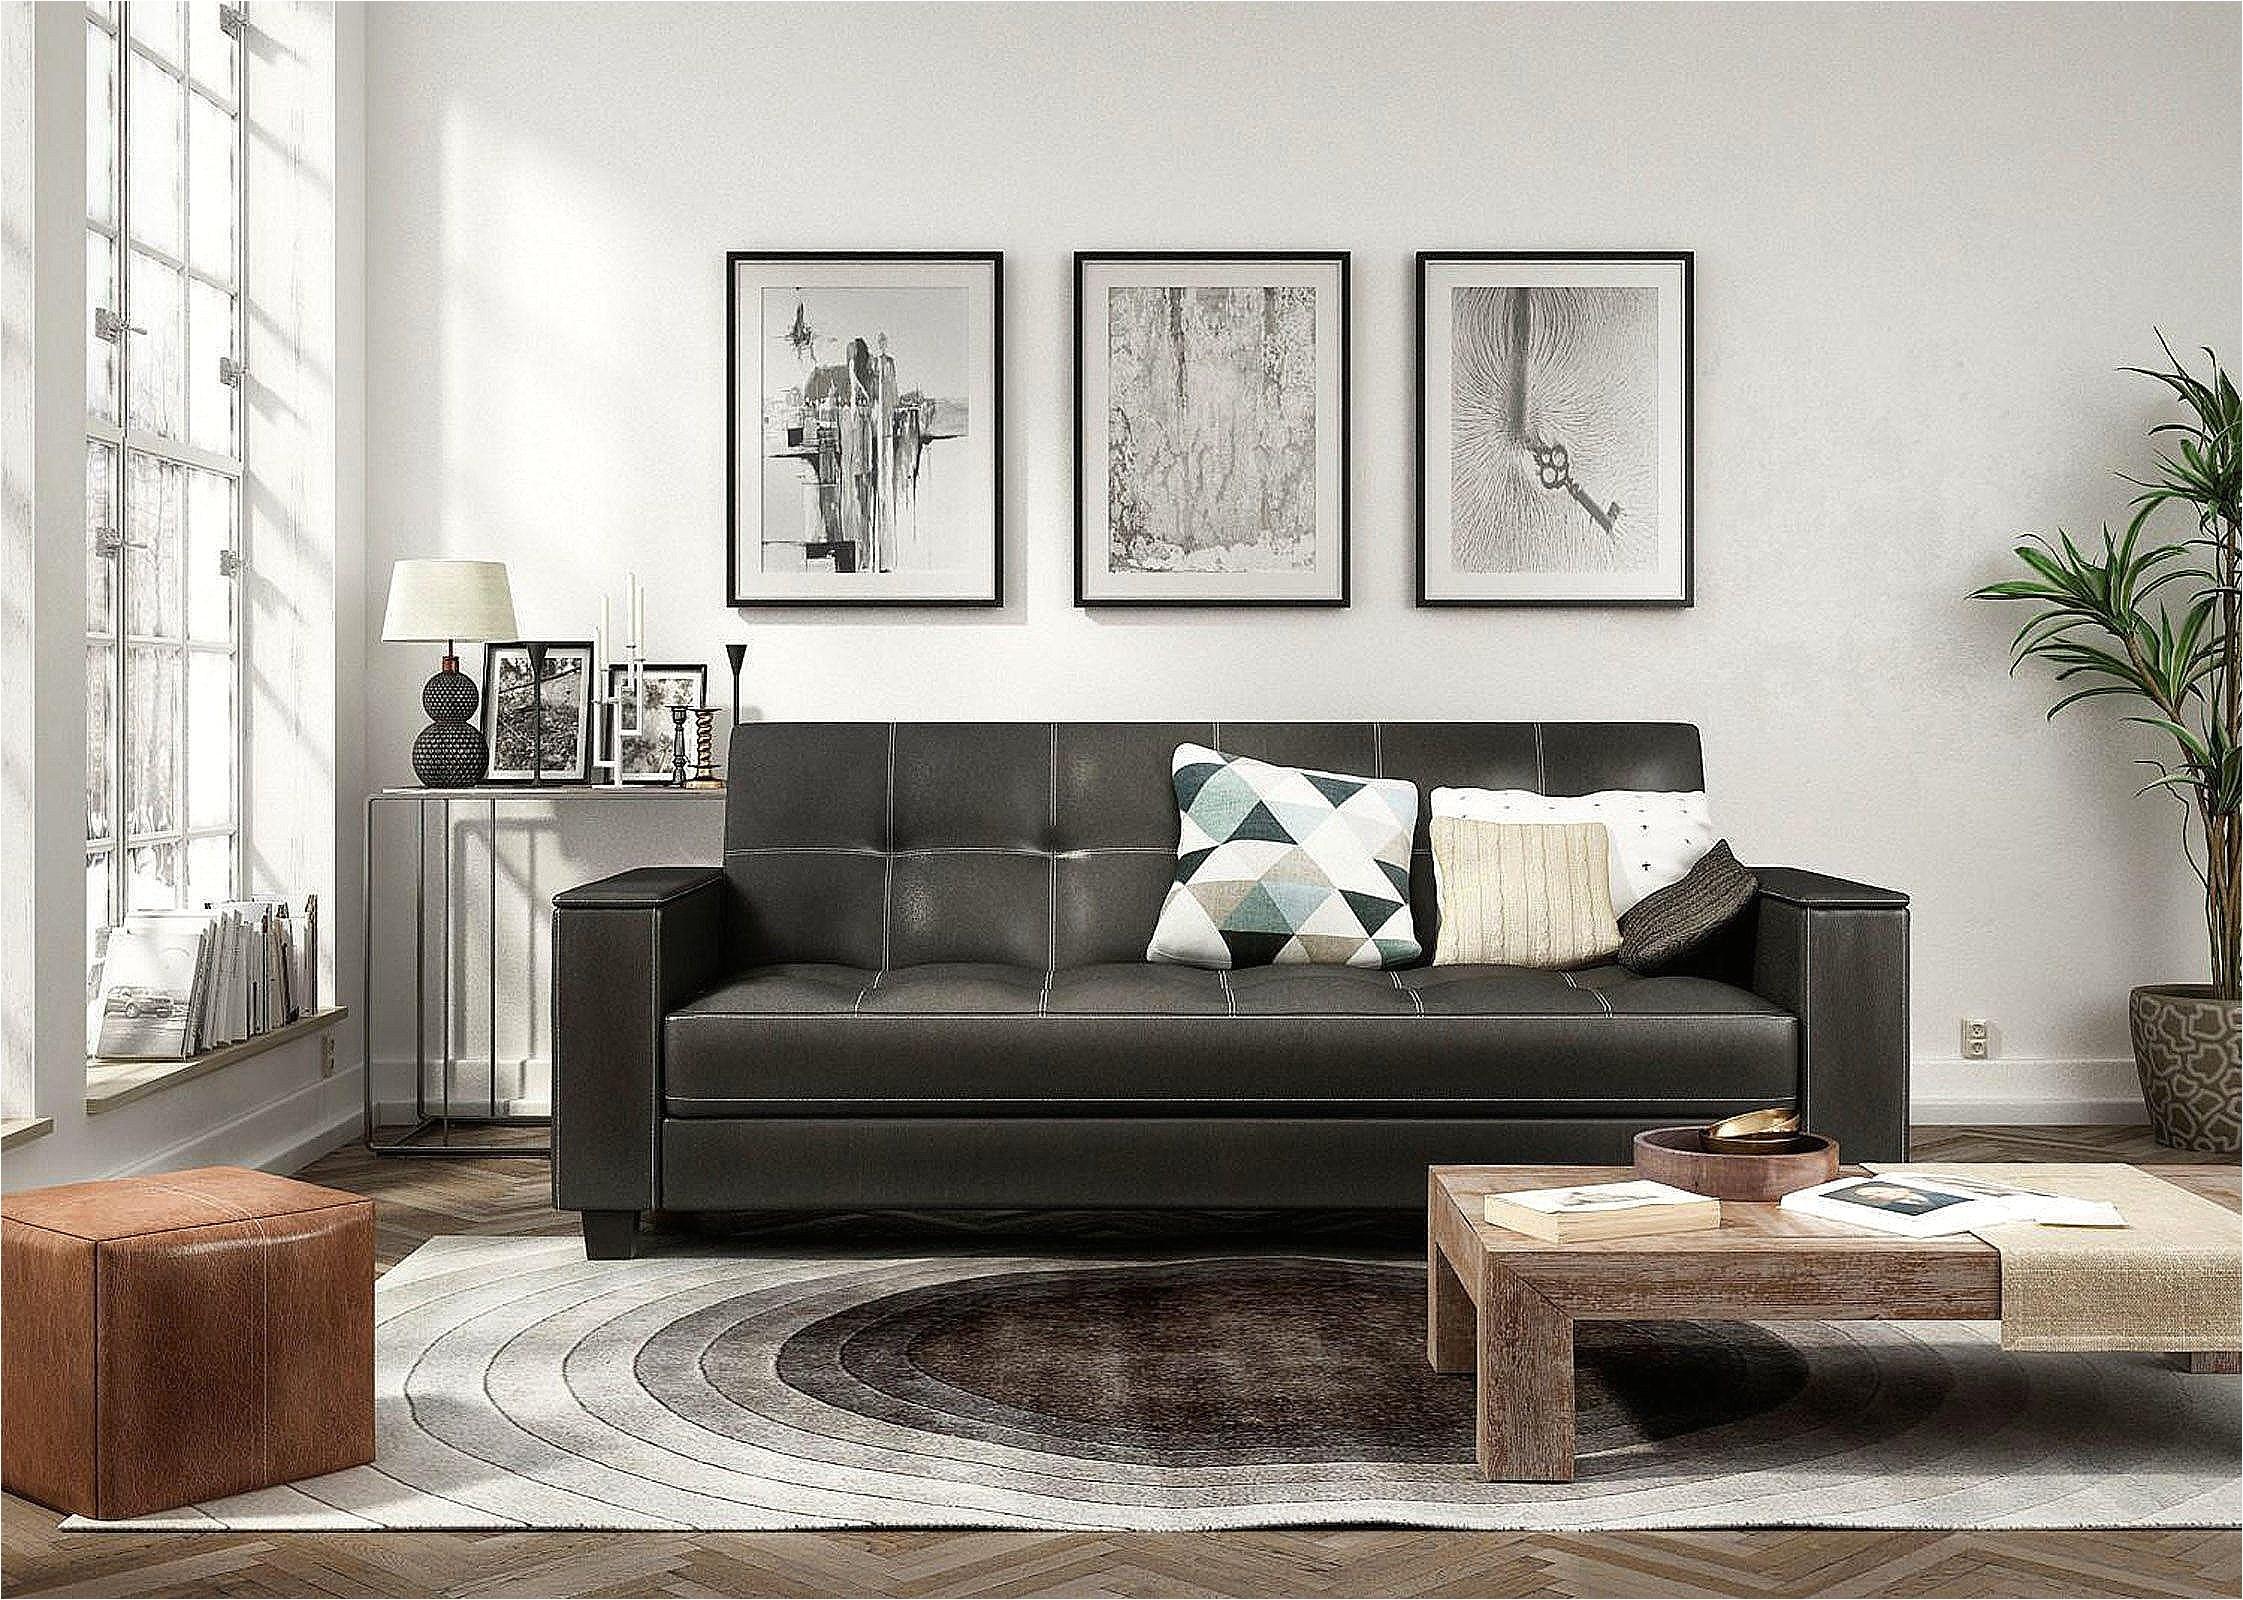 decorative living room couch ideas in modern living room furniture new gunstige sofa macys furniture 0d